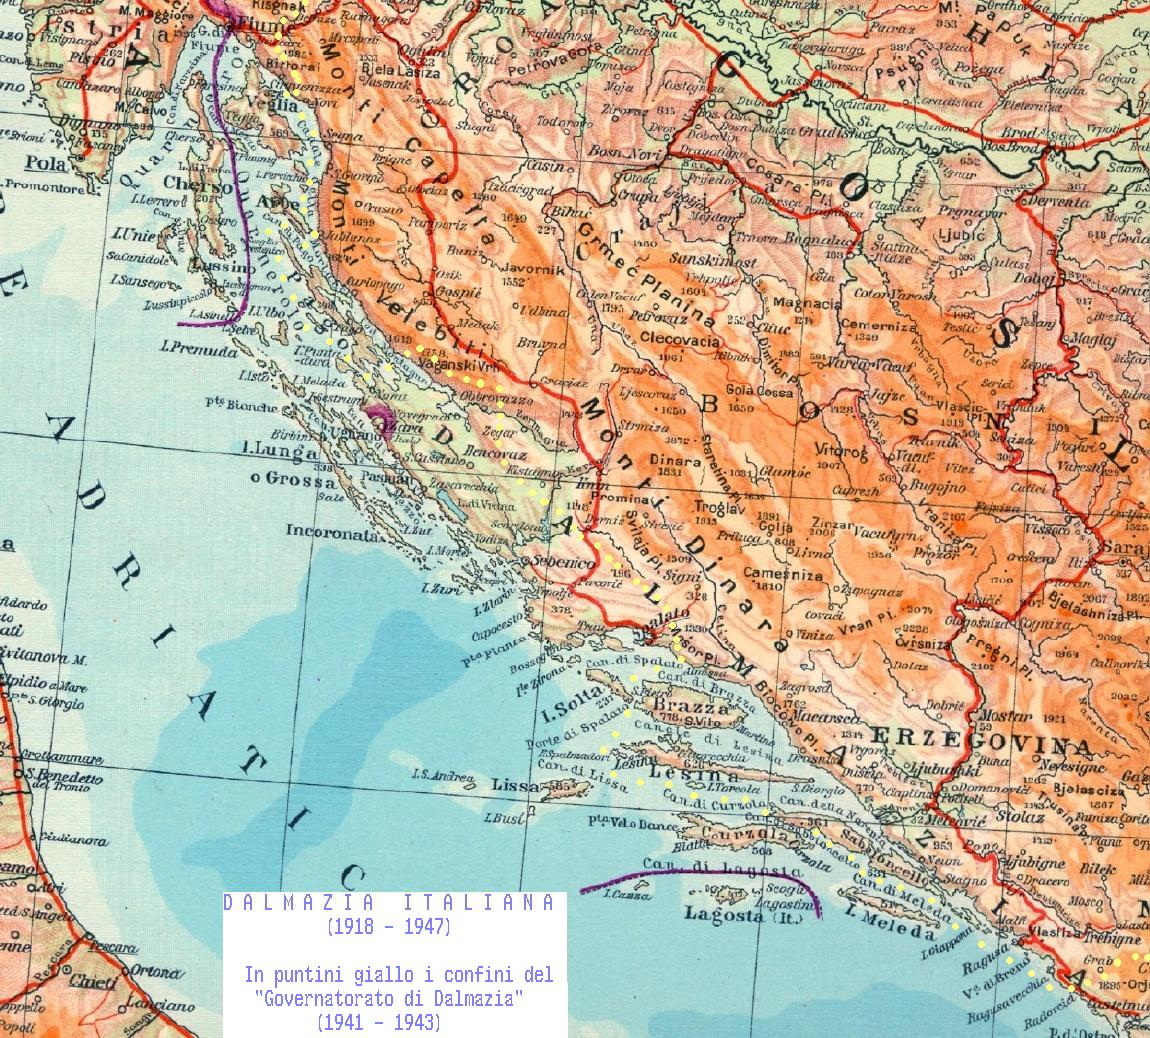 dalmaziaitaliana1918